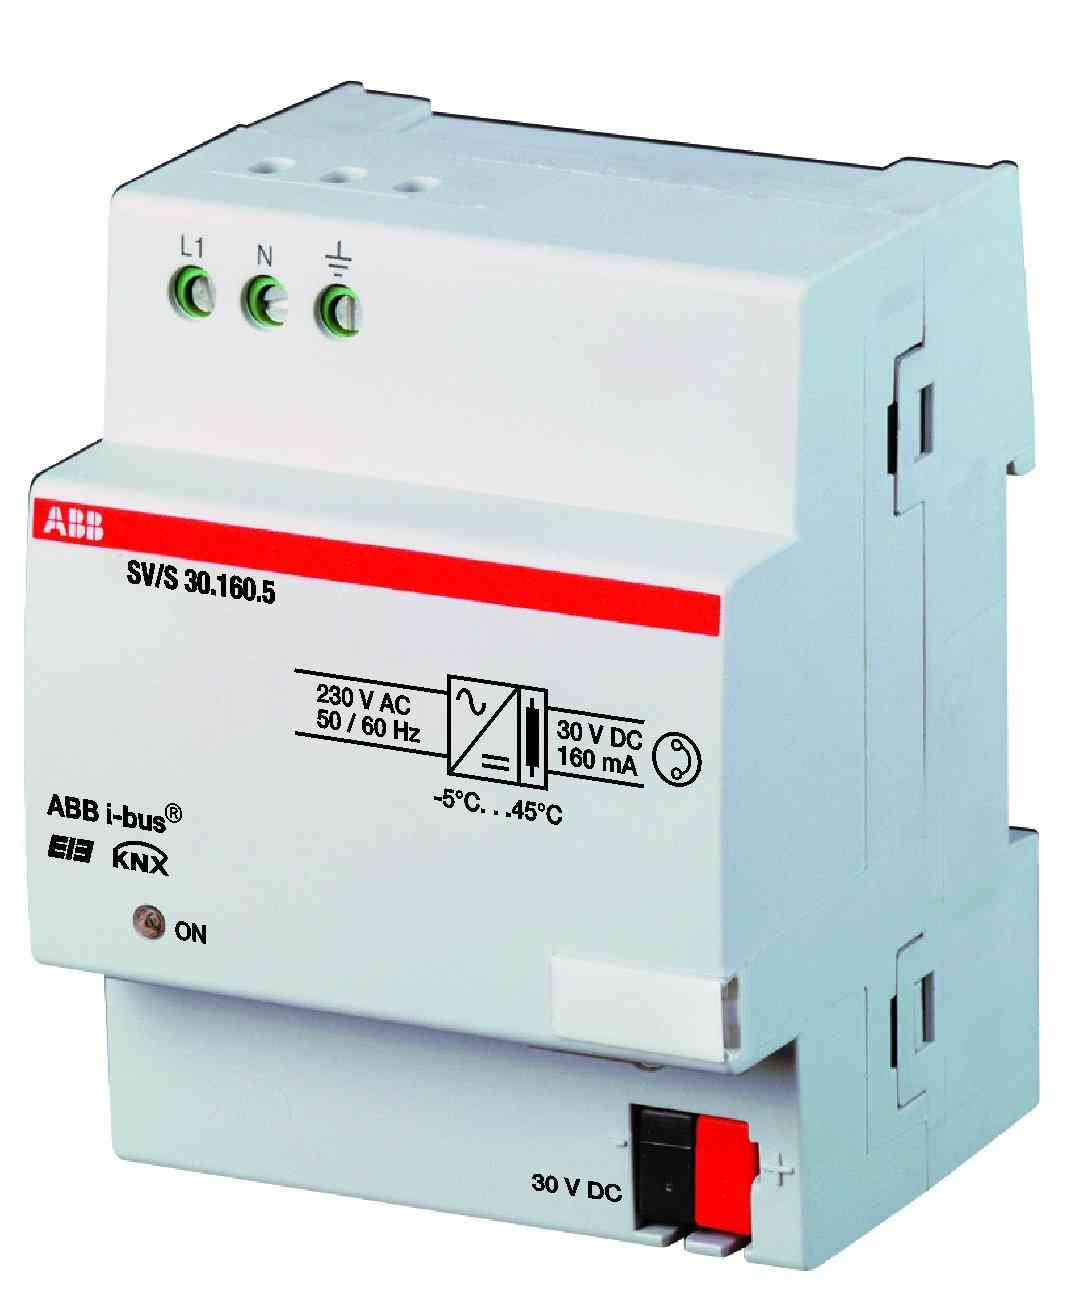 ABB Spannungsversorgung SV/S 30.160.5 2CDG110085R0011